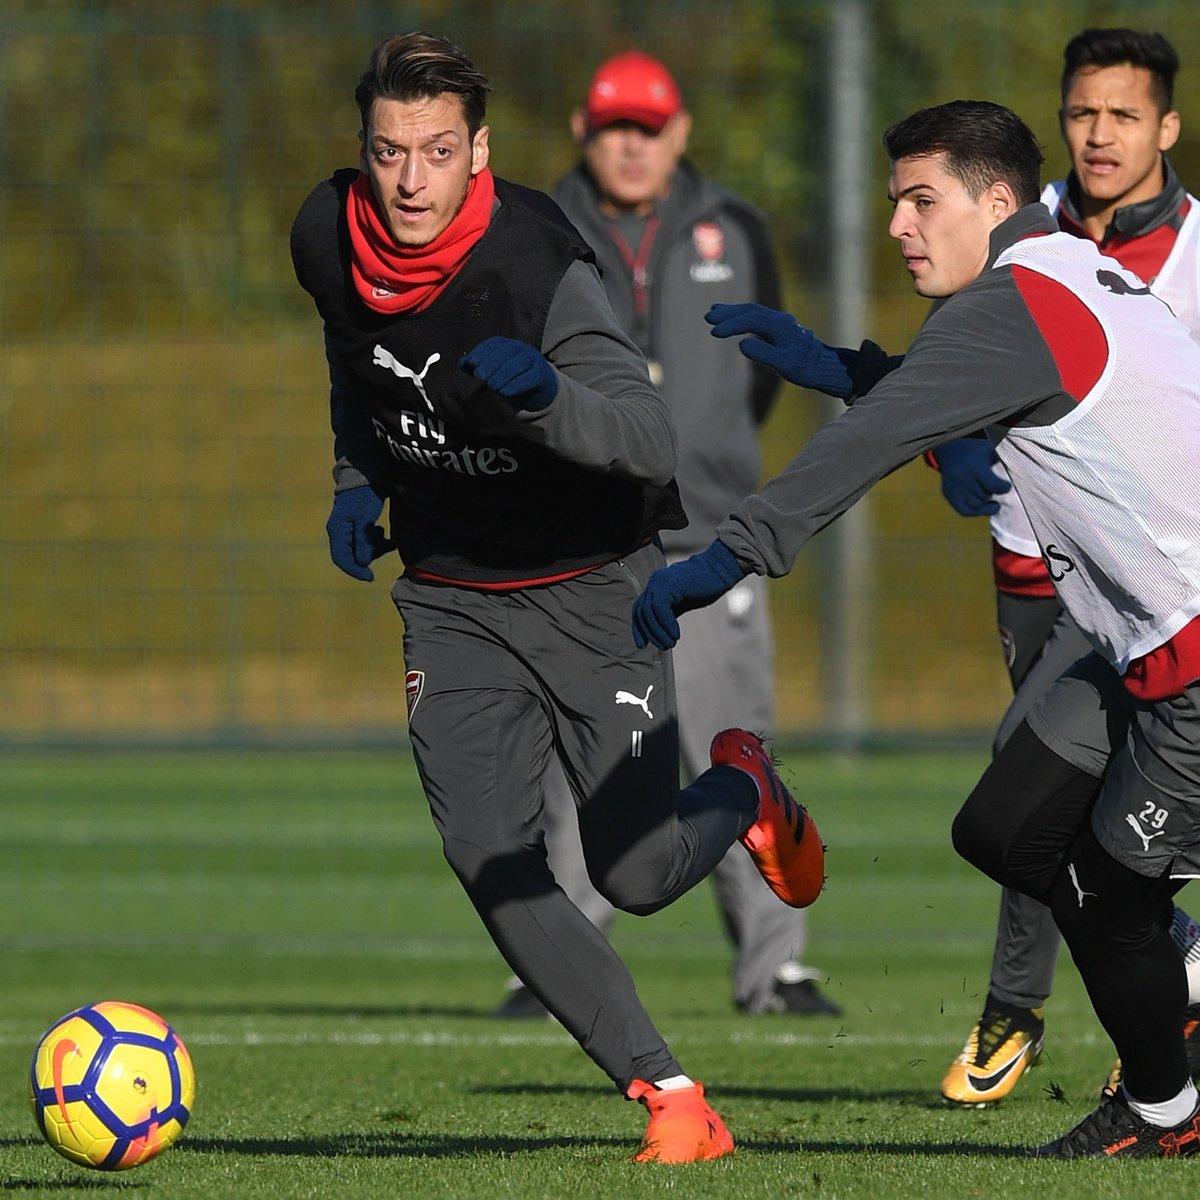 Tomorrow ... Derby Time ⚽💥 #COYG #AFCvTHFC #NorthLondonDerby @Arsenal